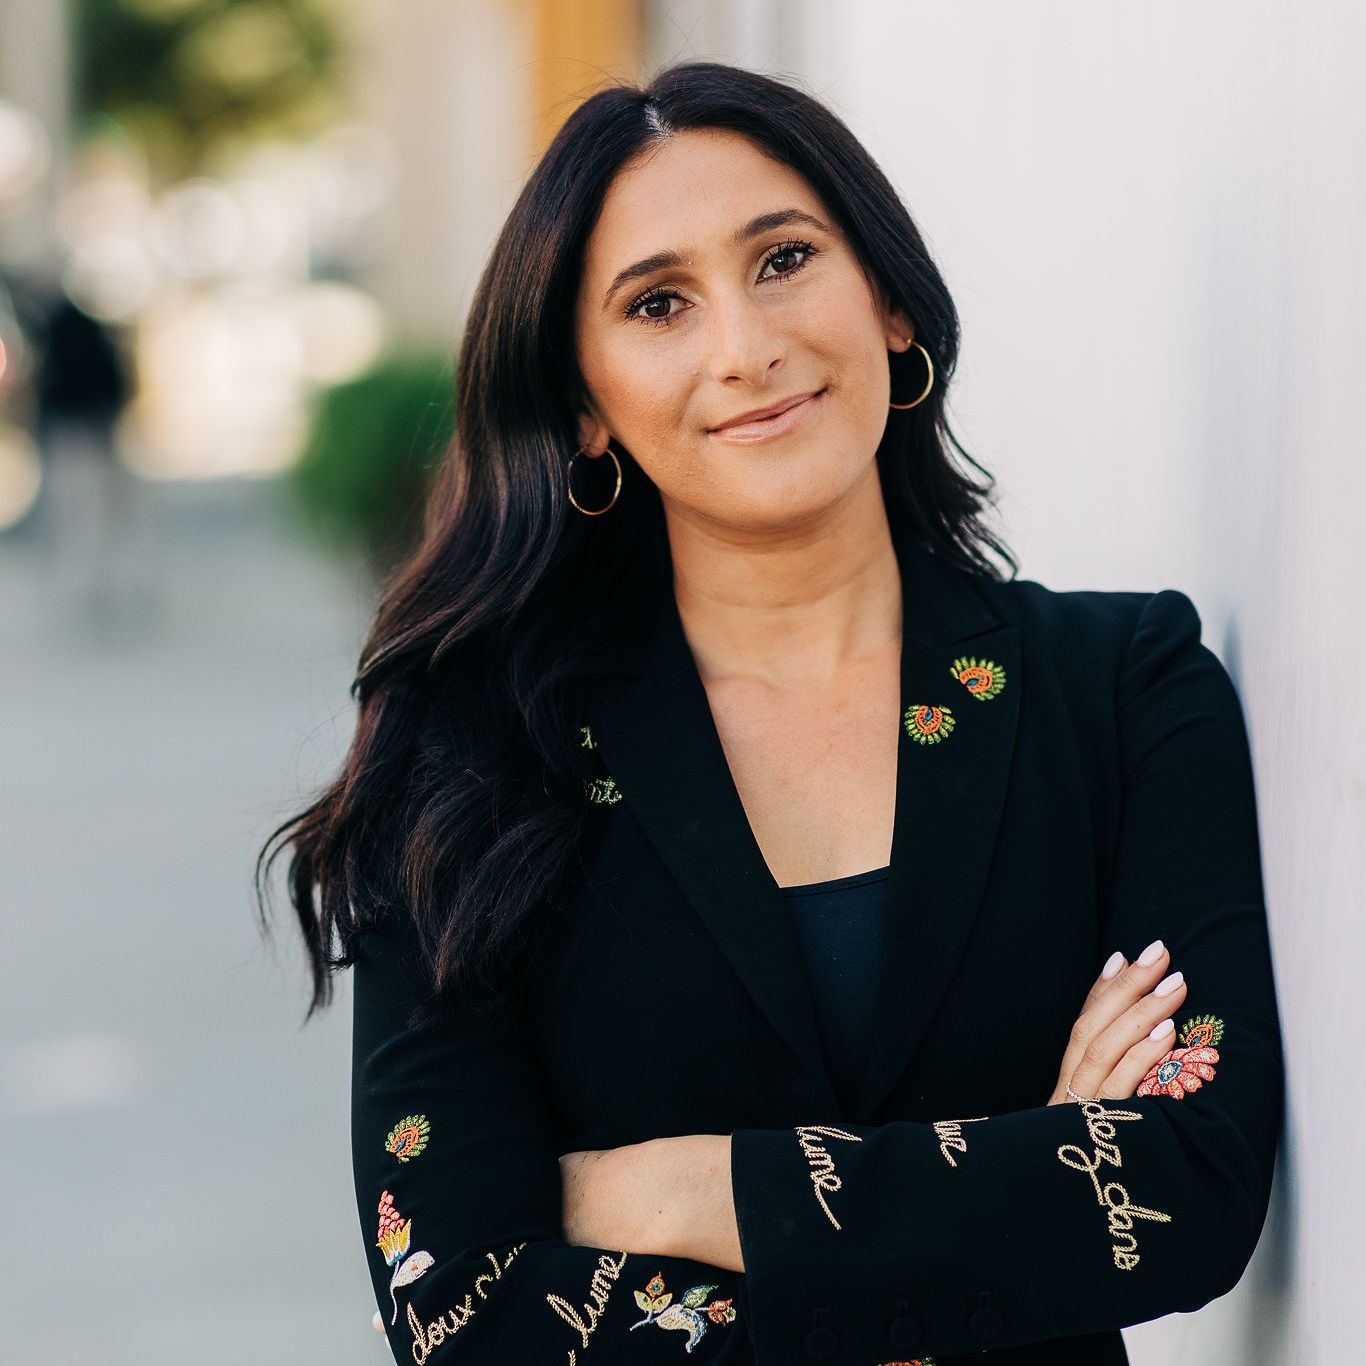 Megan Daversa from Daversa Partners